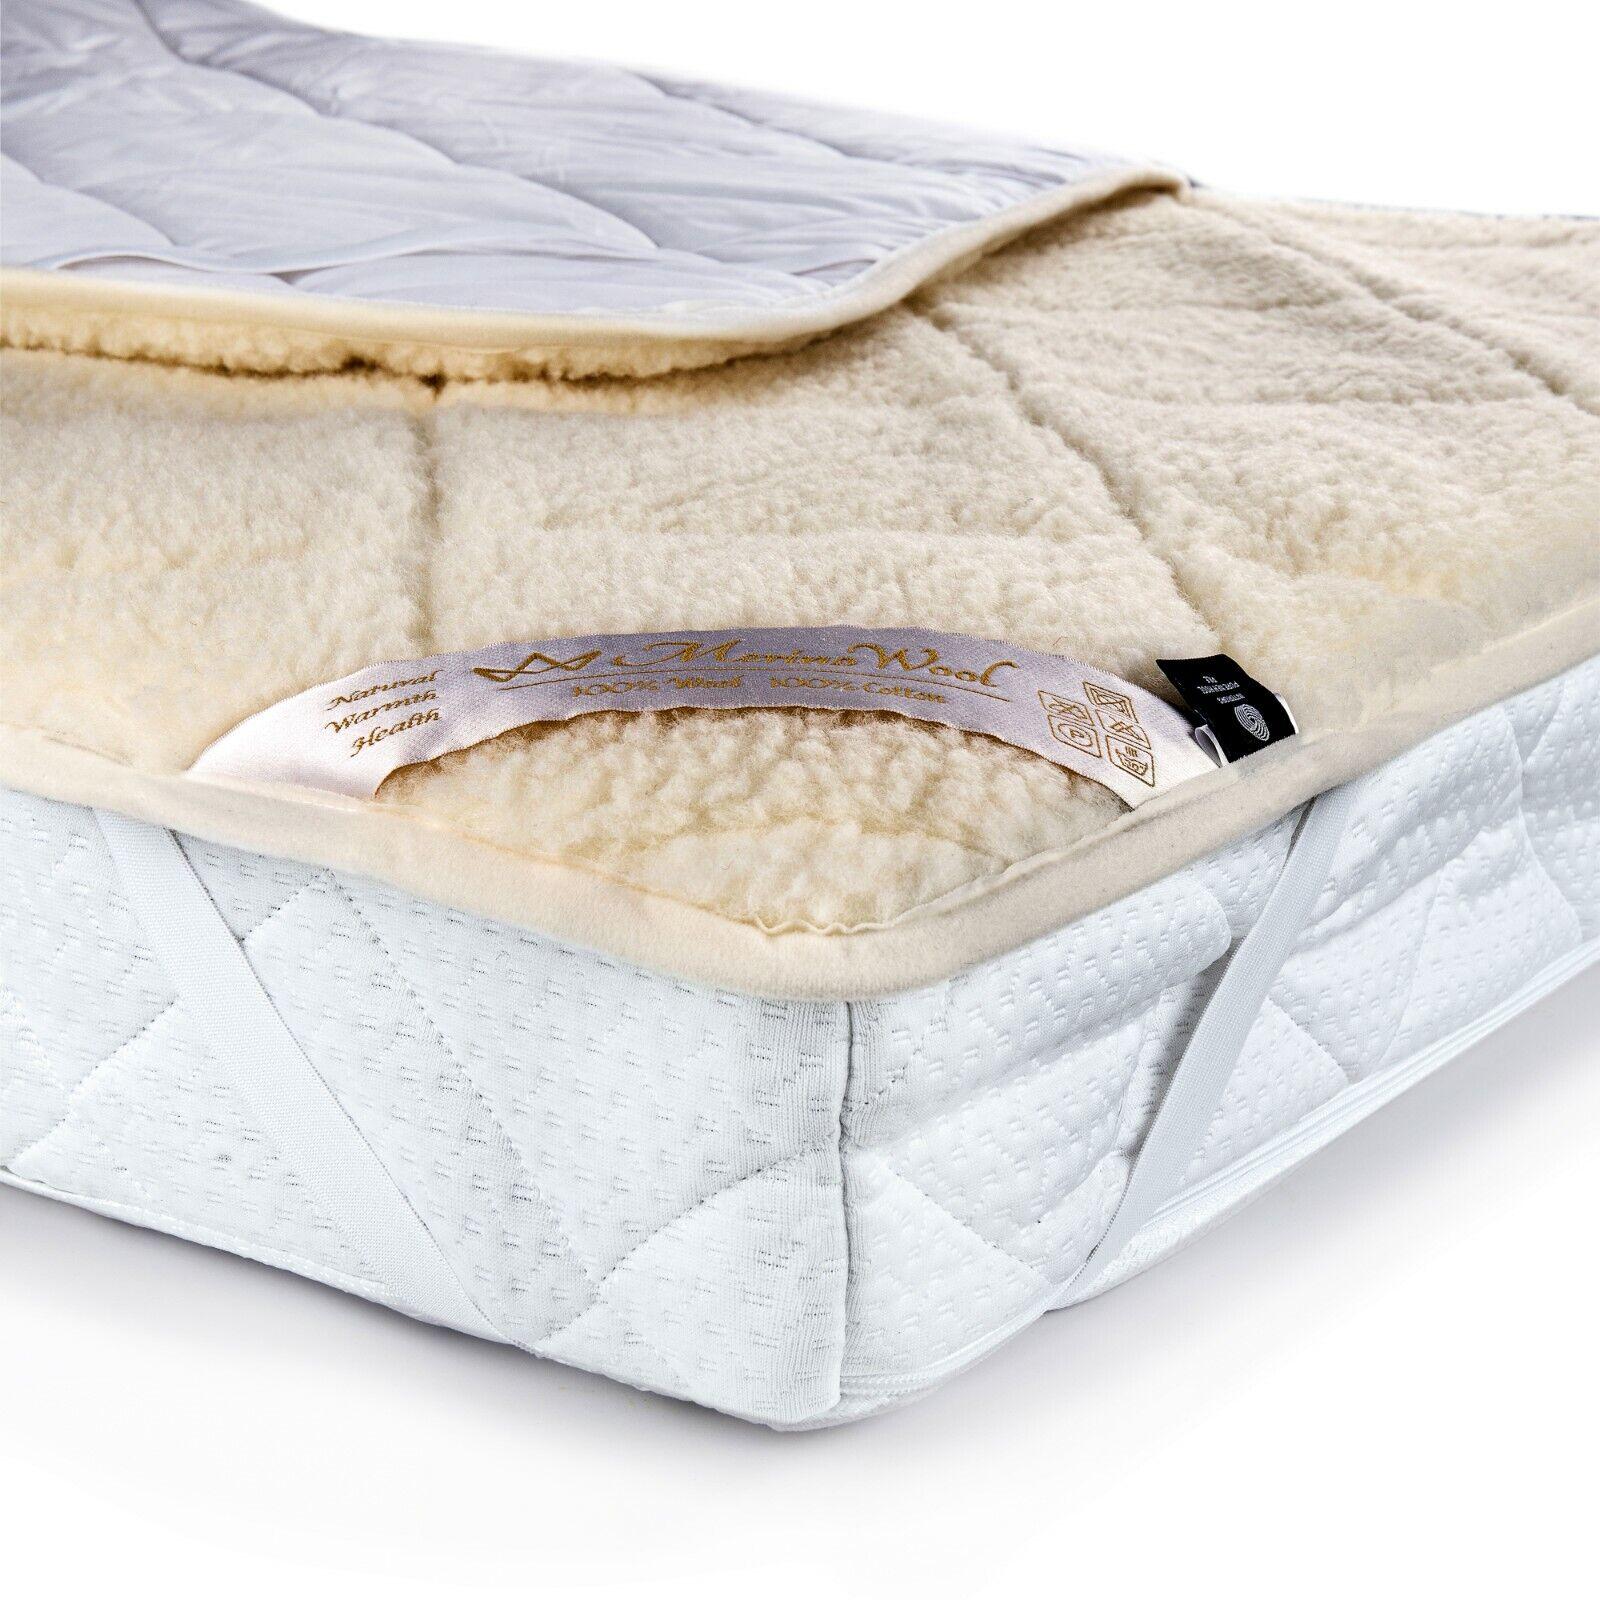 Merino Wool Underblanket 100 Natural Medical Mattress Topper Bed Corner Straps Ebay